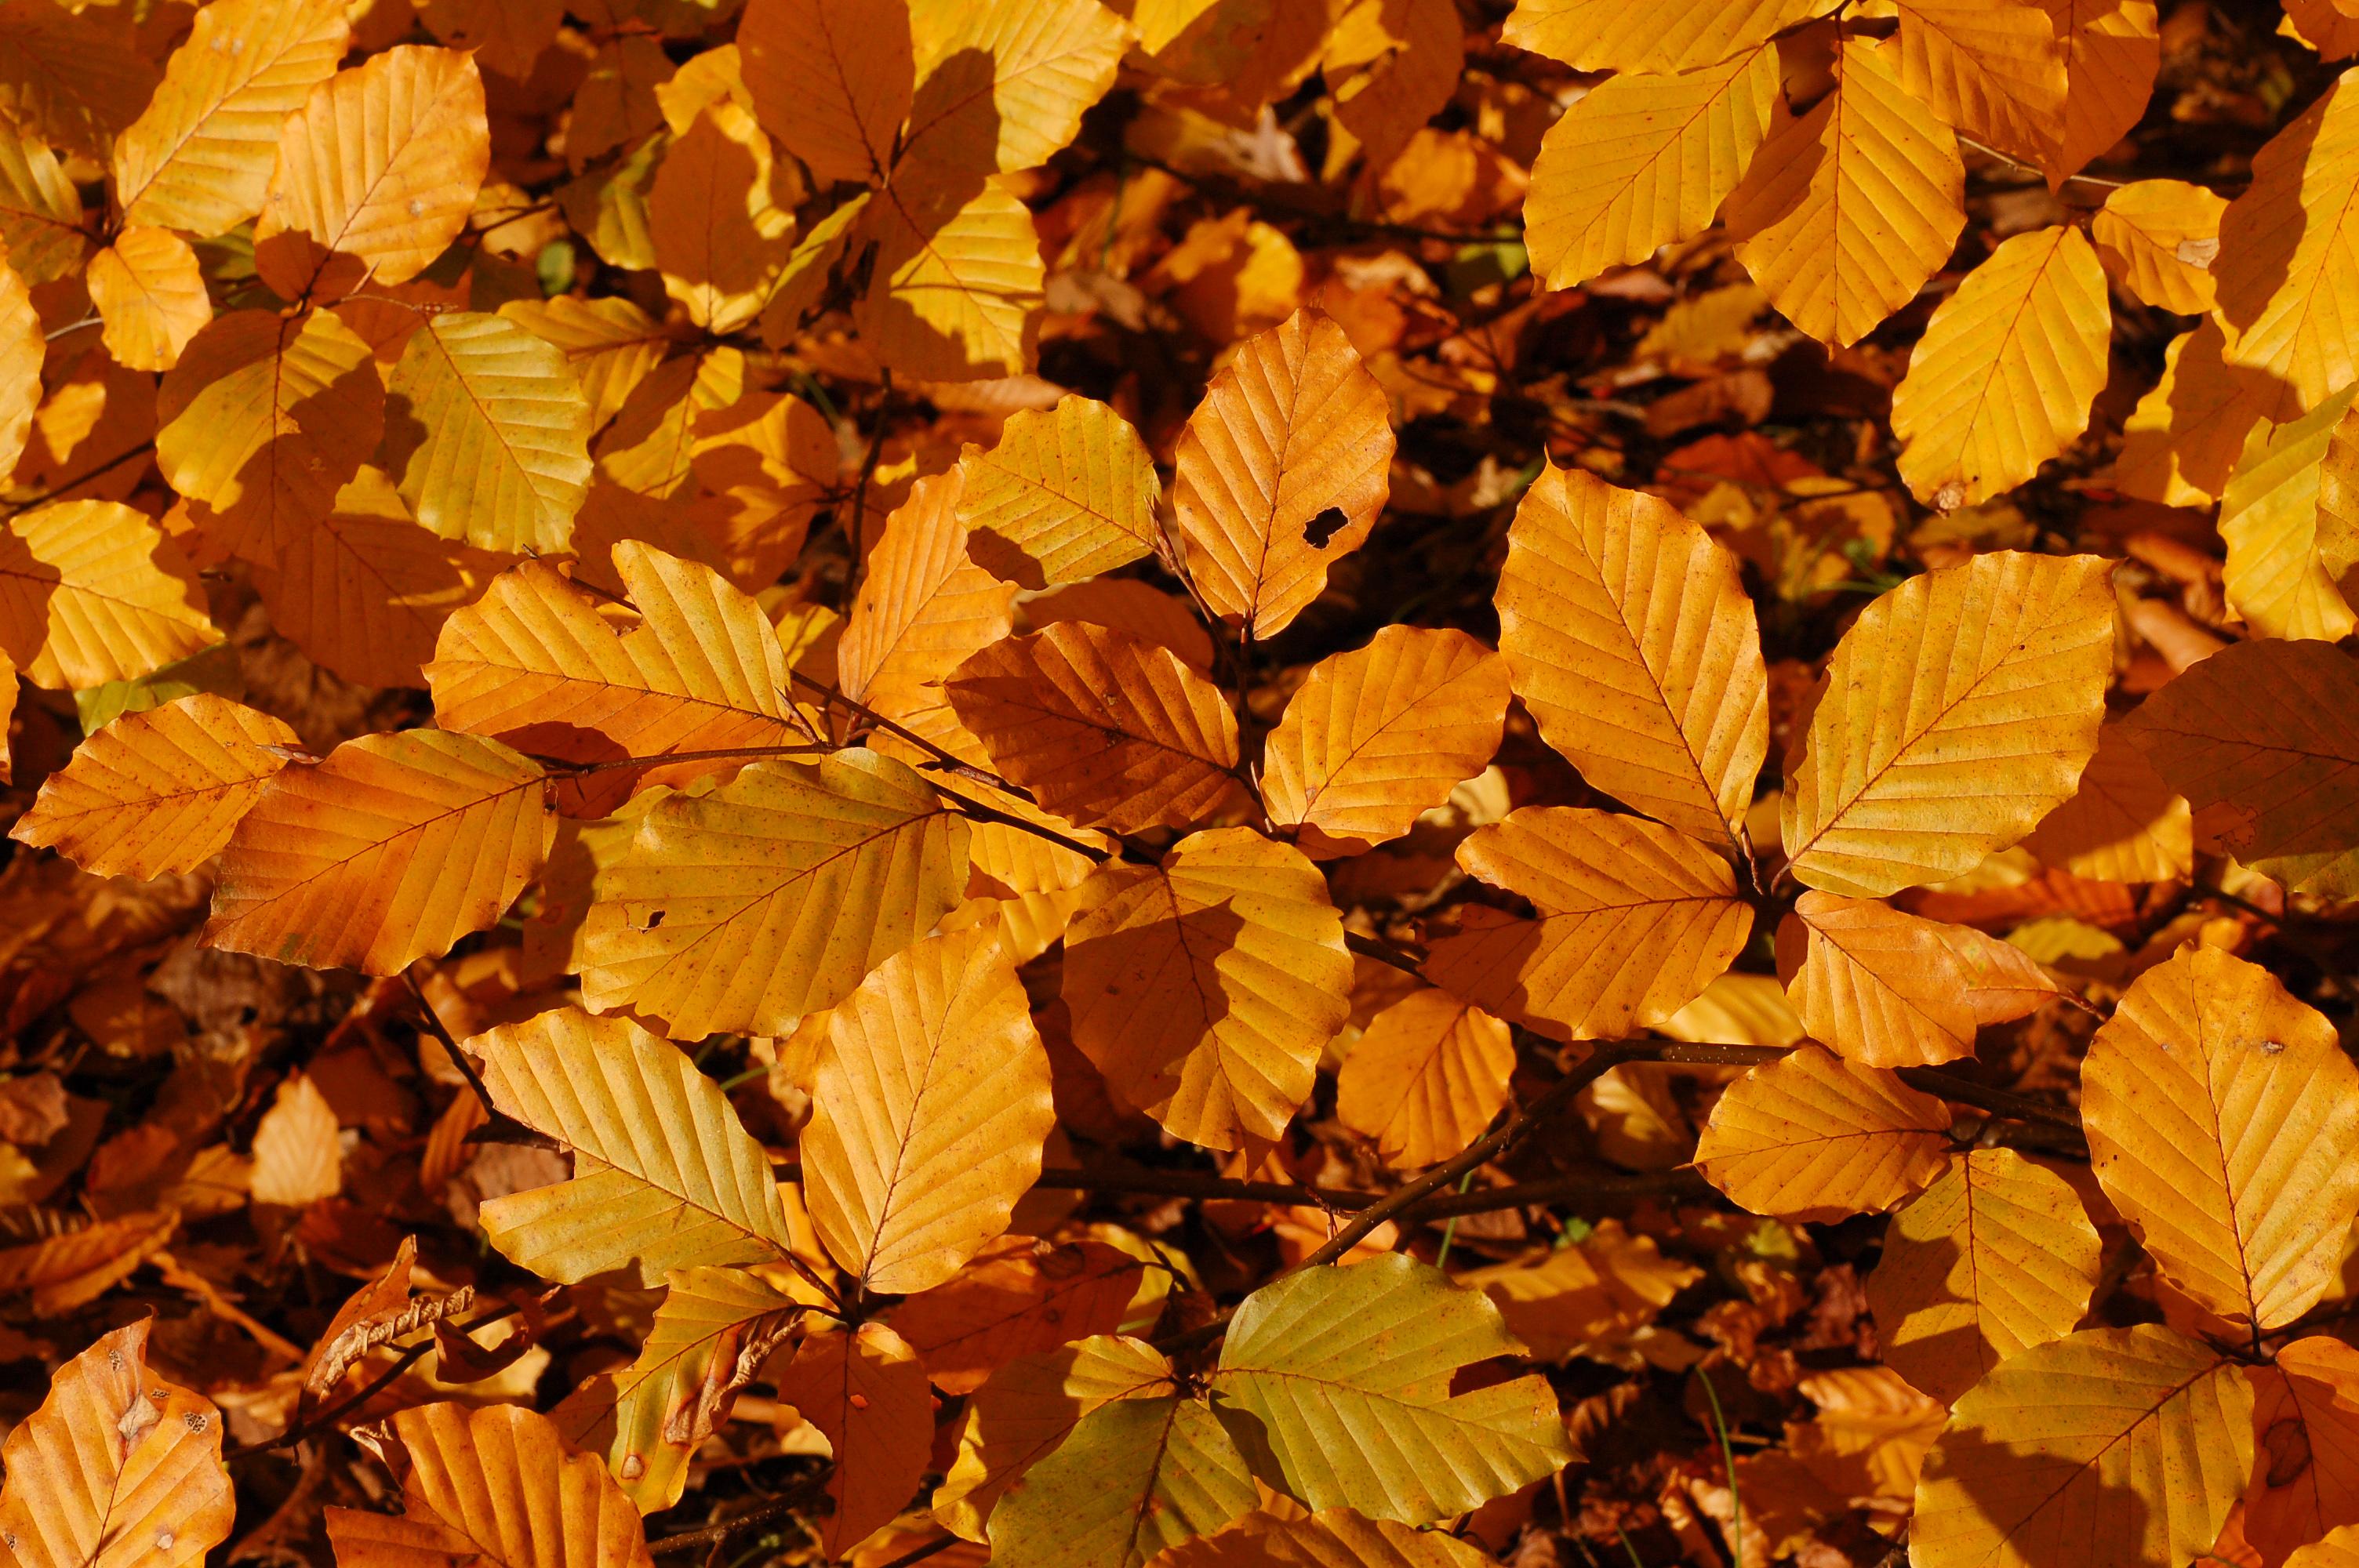 File Copper Beech Fagus Sylvatica F Purpurea Autumn Leaves Closeup 3008px Jpg Wikimedia Commons